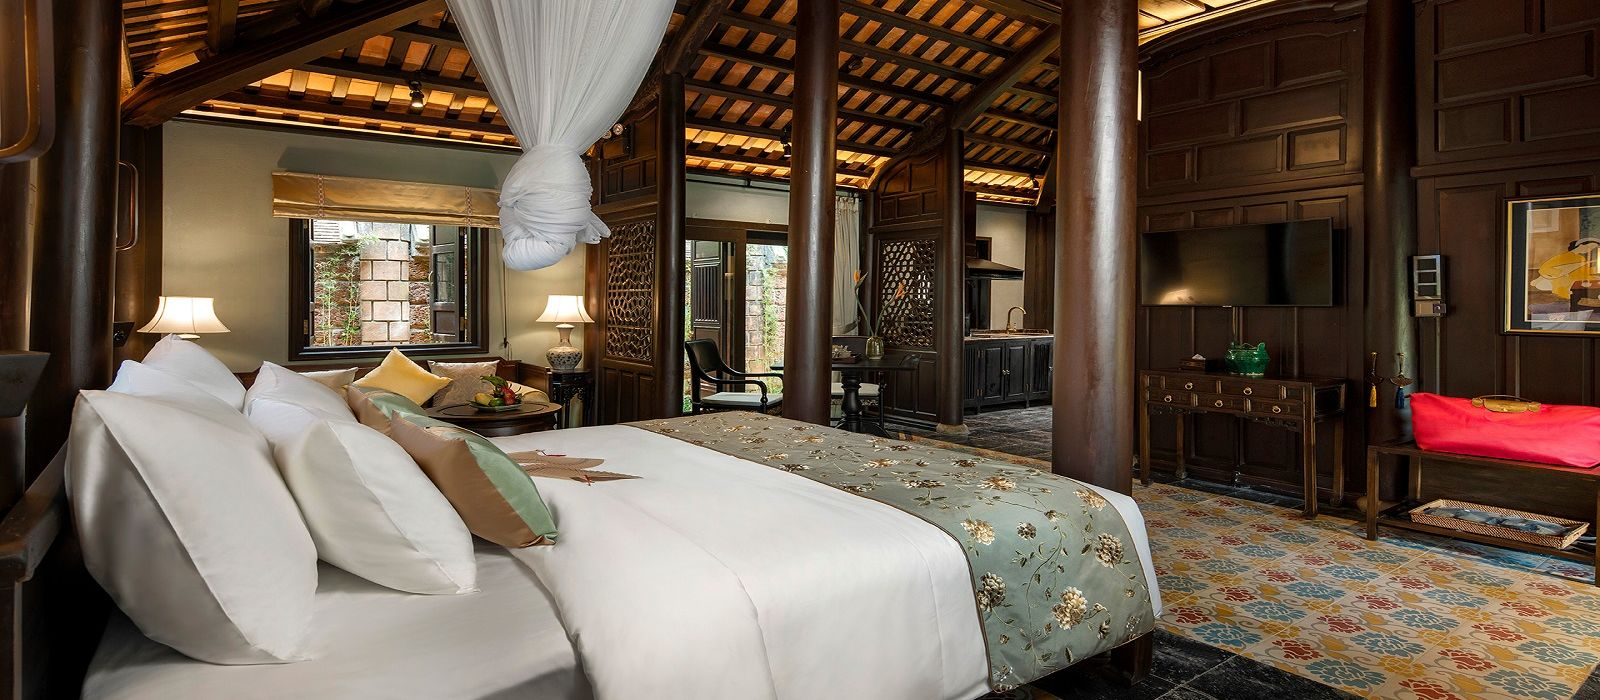 Hotel Ancient Hue Garden House Vietnam